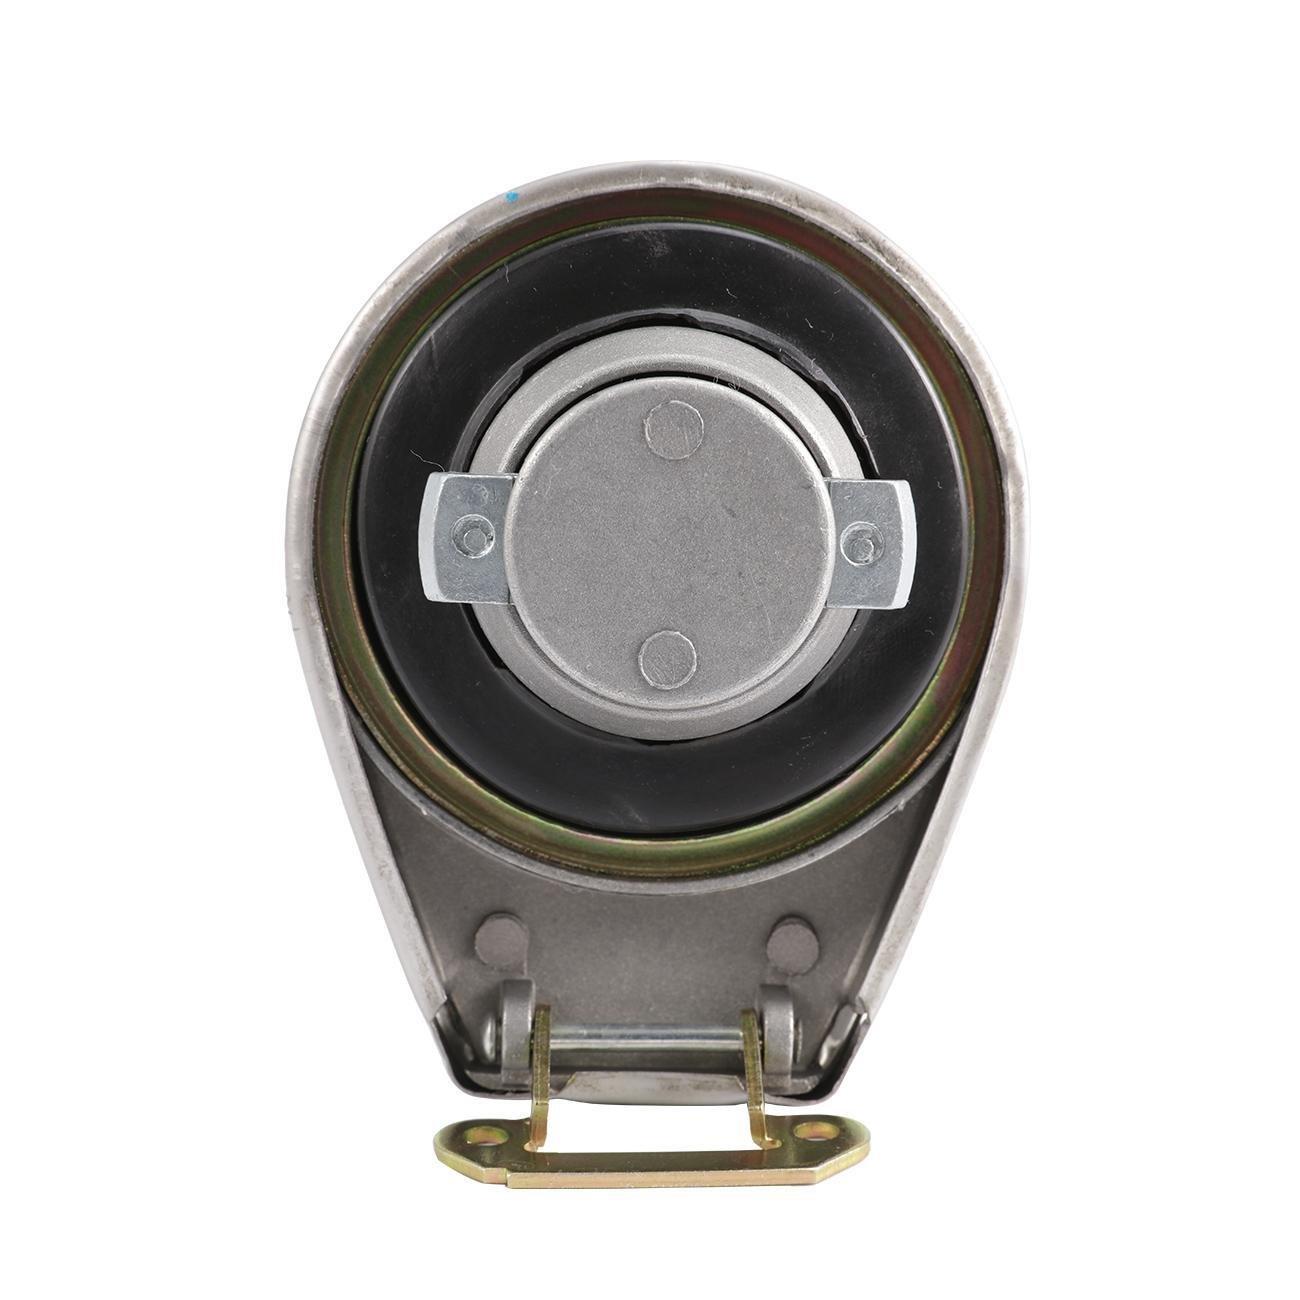 INNOGLOW Gas Fuel Tank Cap for Honda Petrol Locking Polished VF750C VF750 VF 750 700 VT500C Chrome